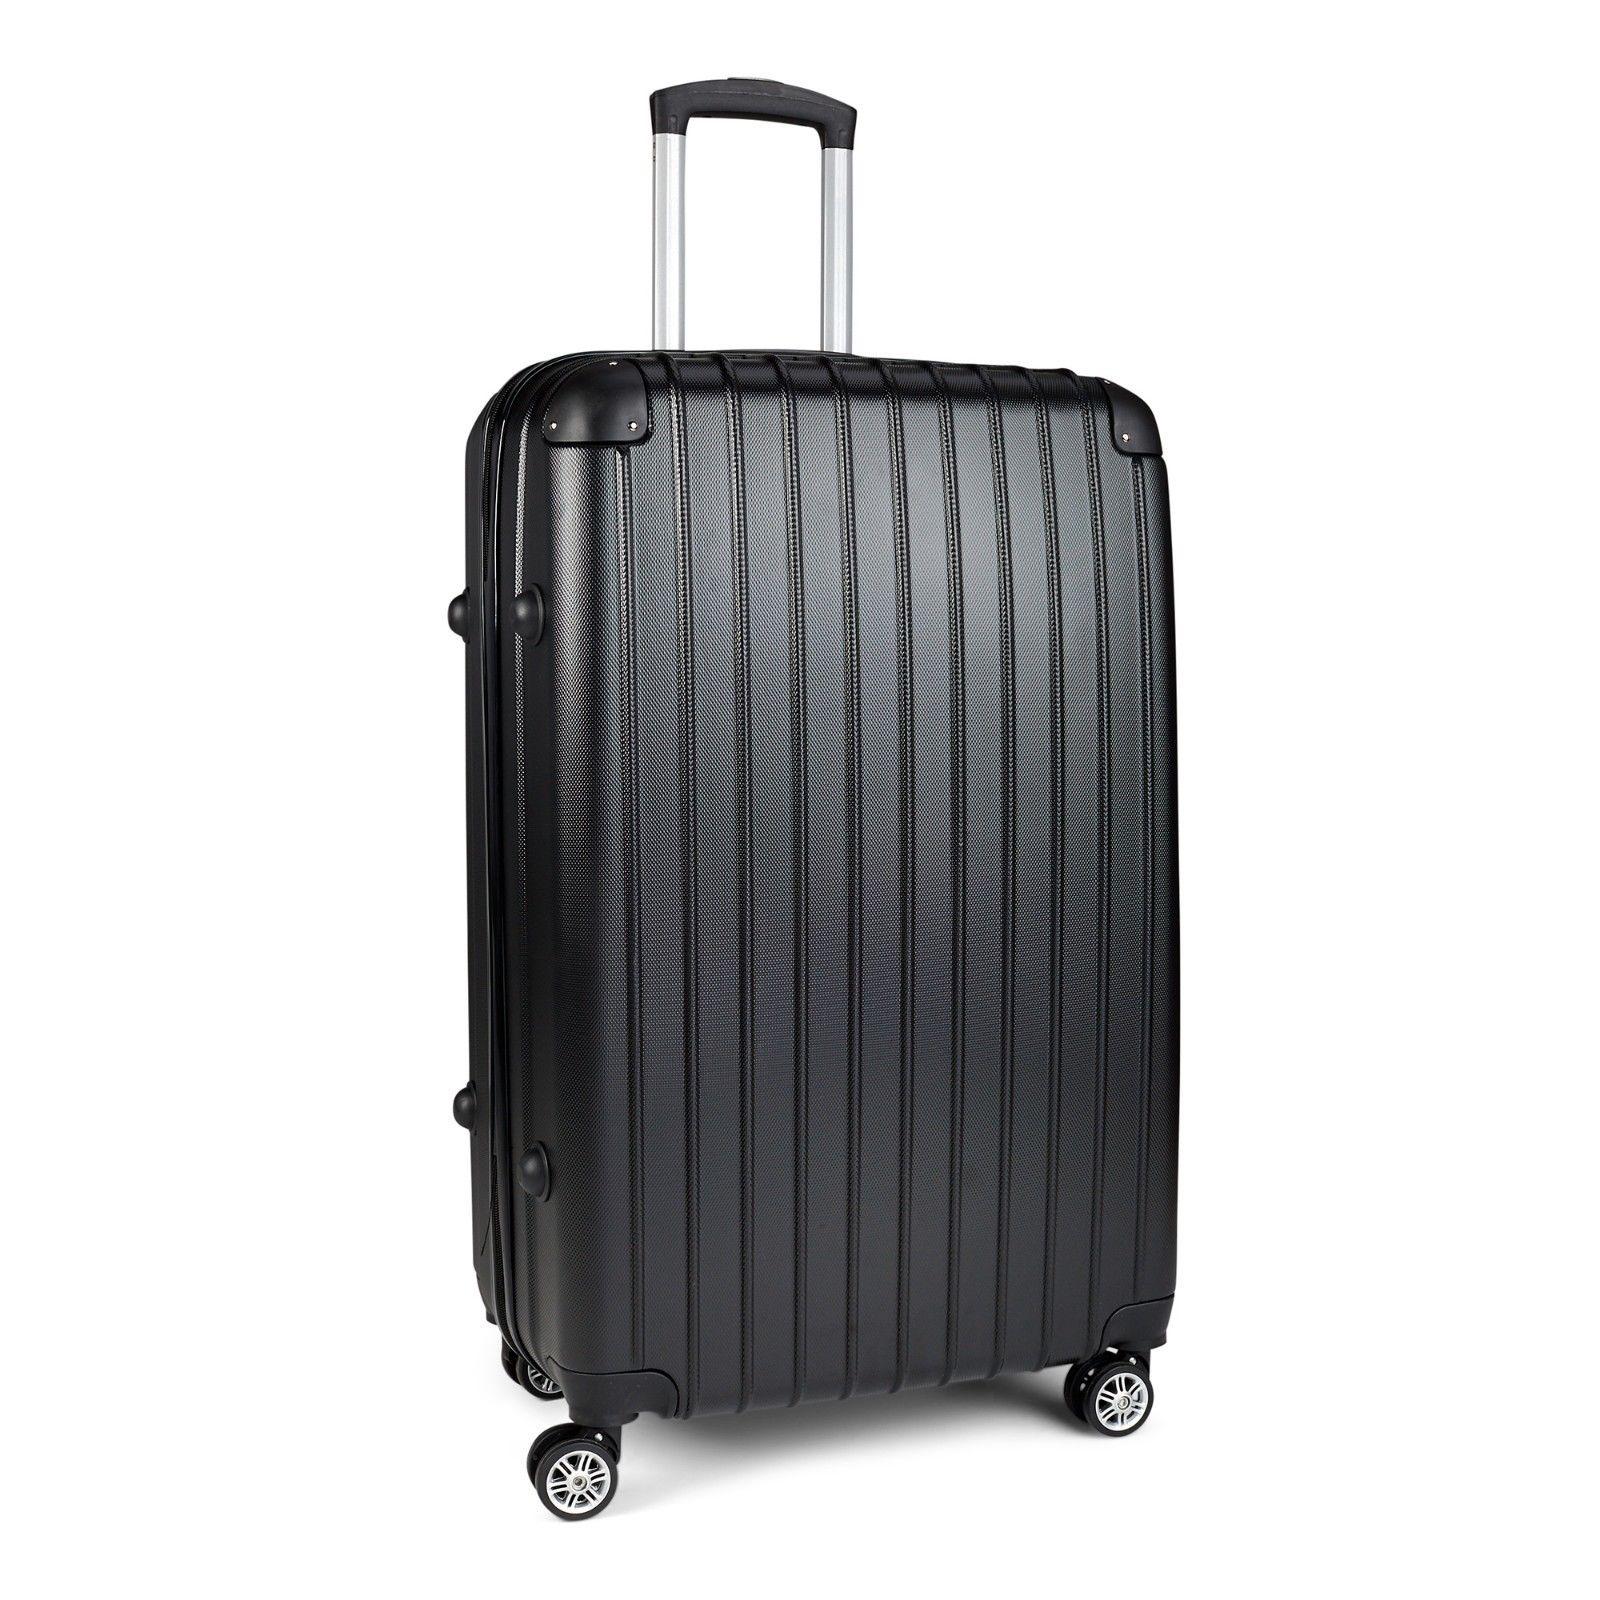 Milano-Premium-3pc-ABS-Luggage-Suitcase-Luxury-Hard-Case-Shockproof-Travel-Set thumbnail 10